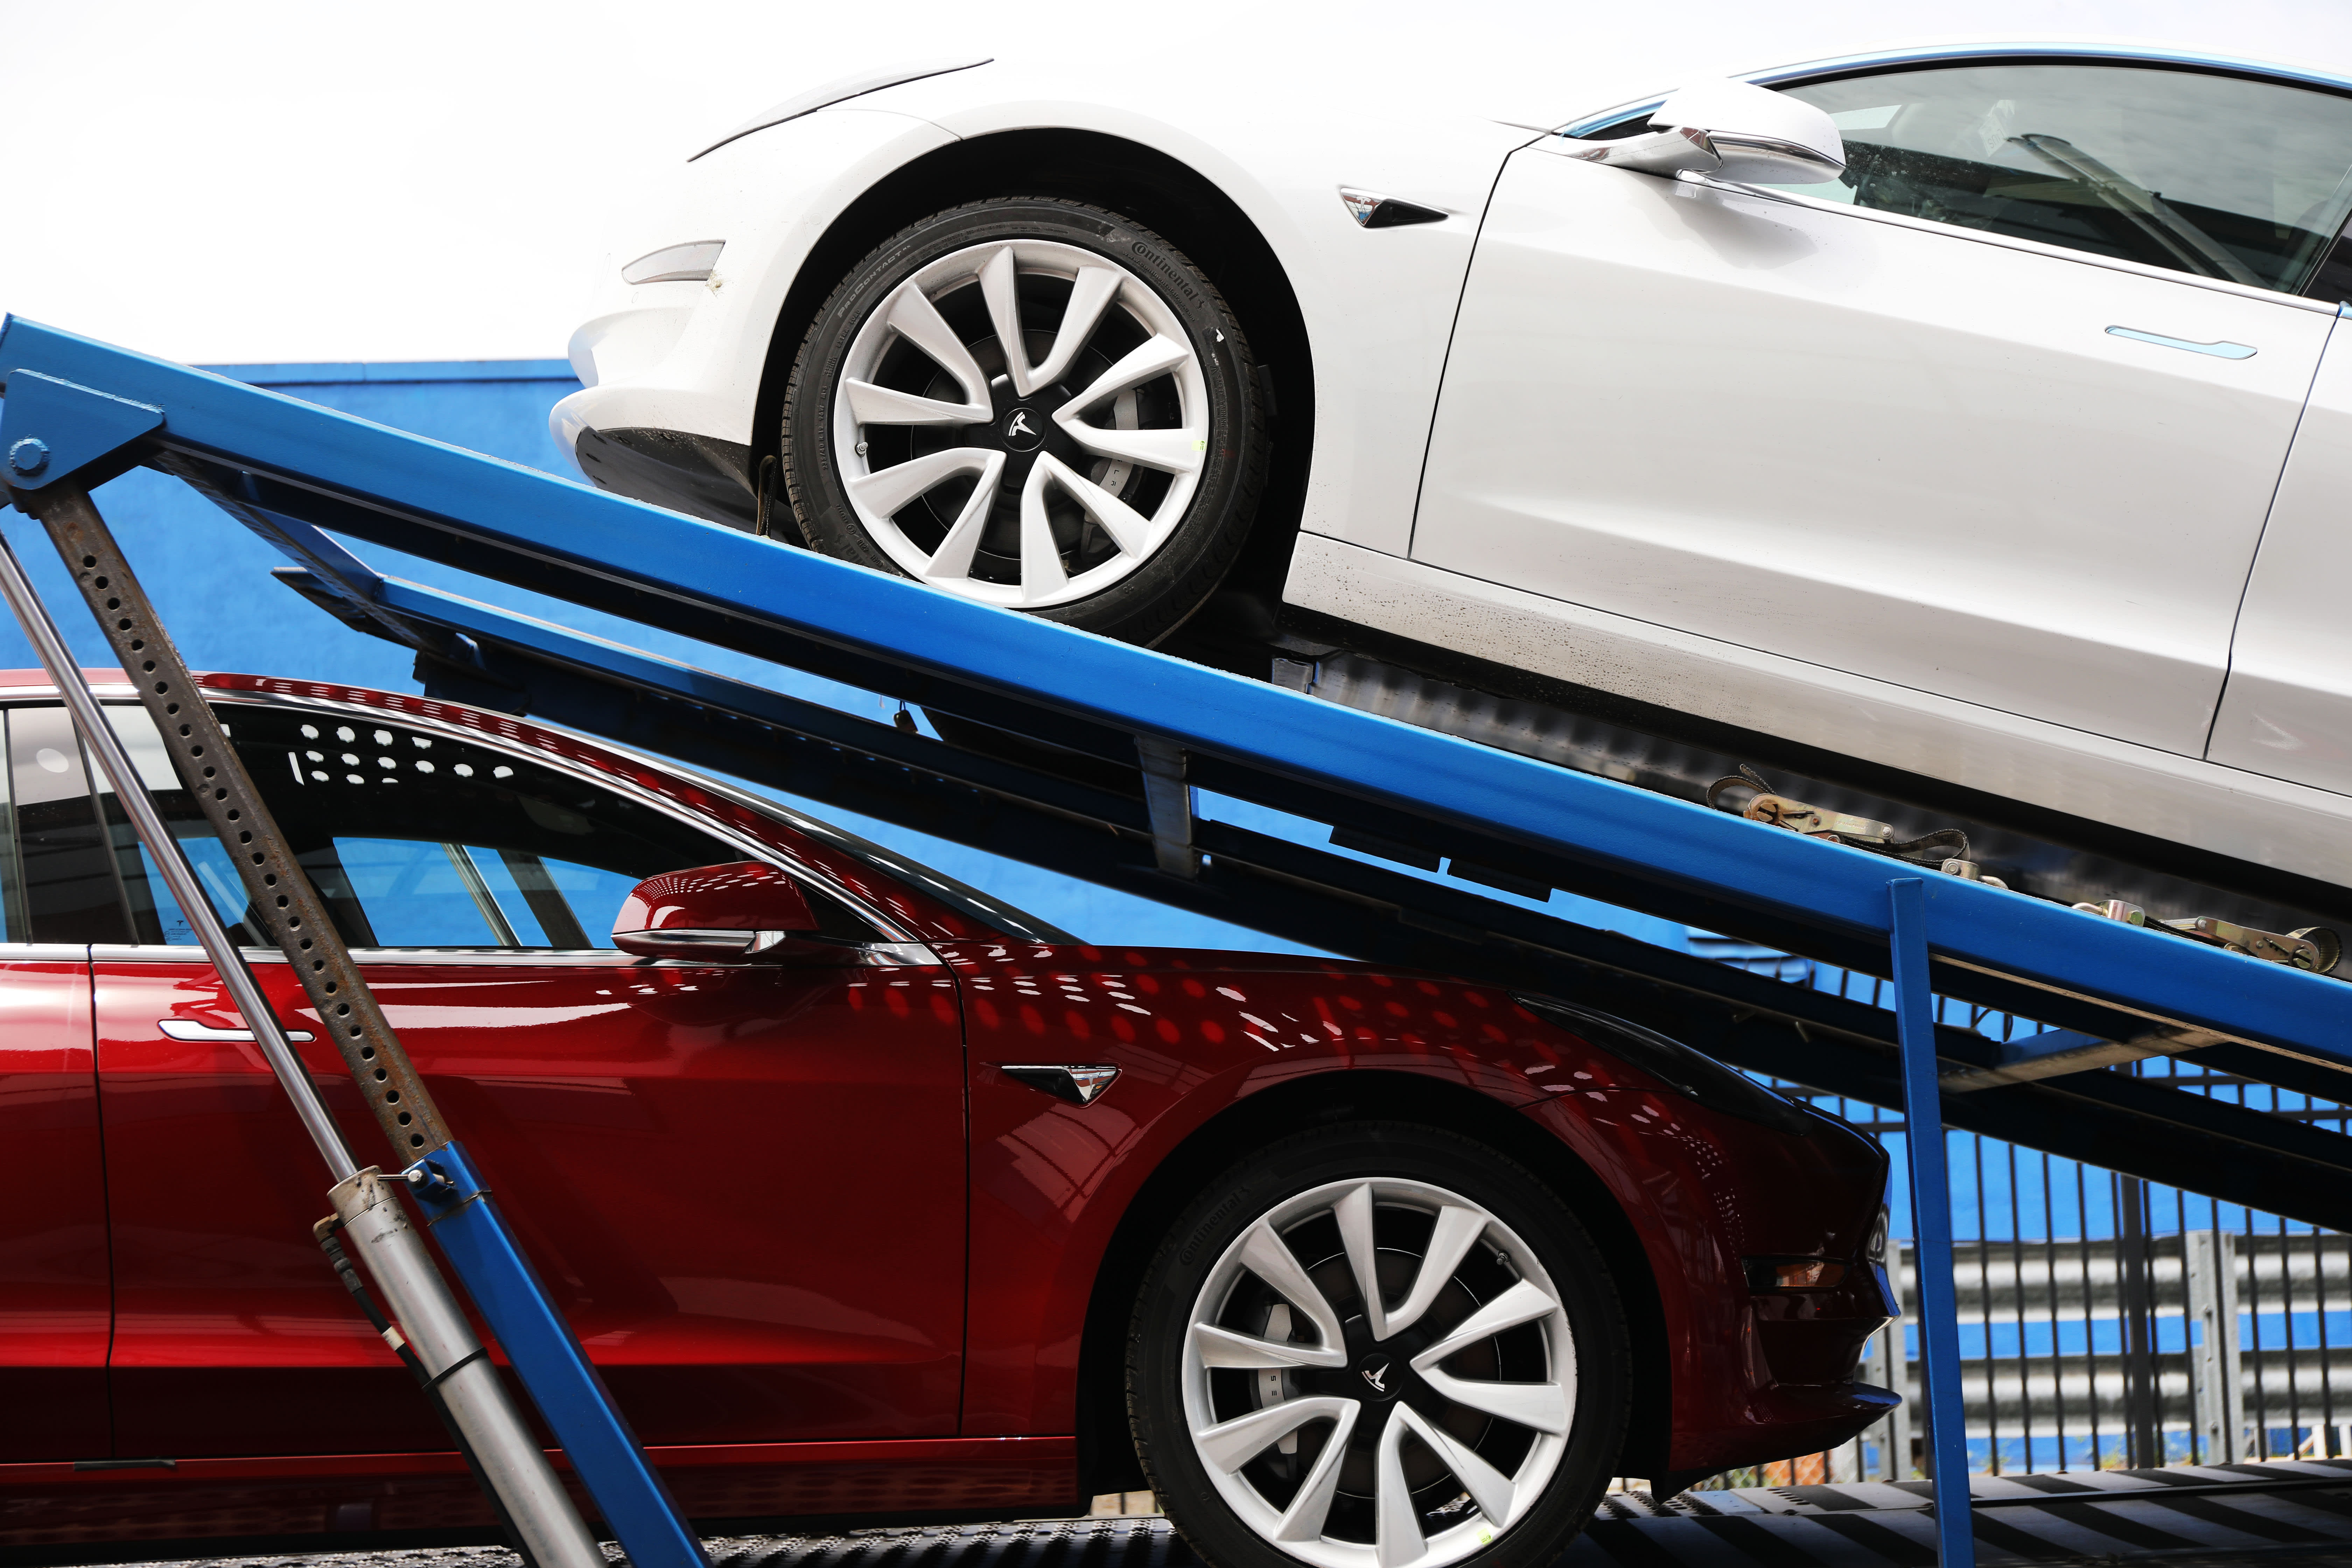 Watch out below as Tesla breaks key support, MKM analyst says